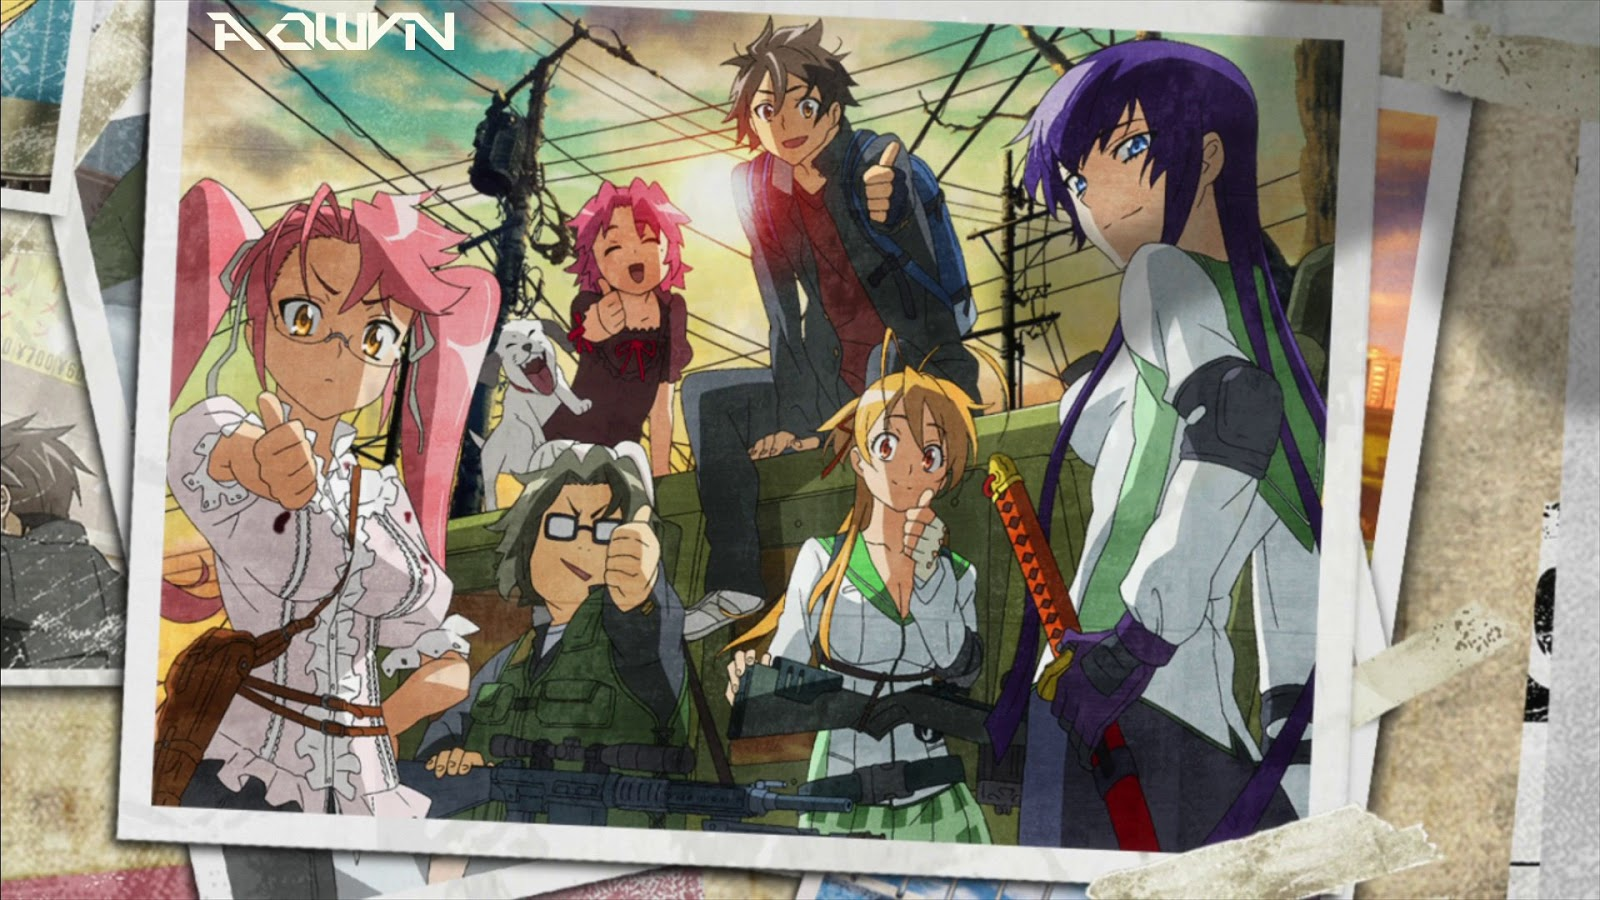 AowVN%2B%25282%2529 - [ Anime 3gp Mp4 ] Highschool of the Dead Bluray | Vietsub - cực cuốn